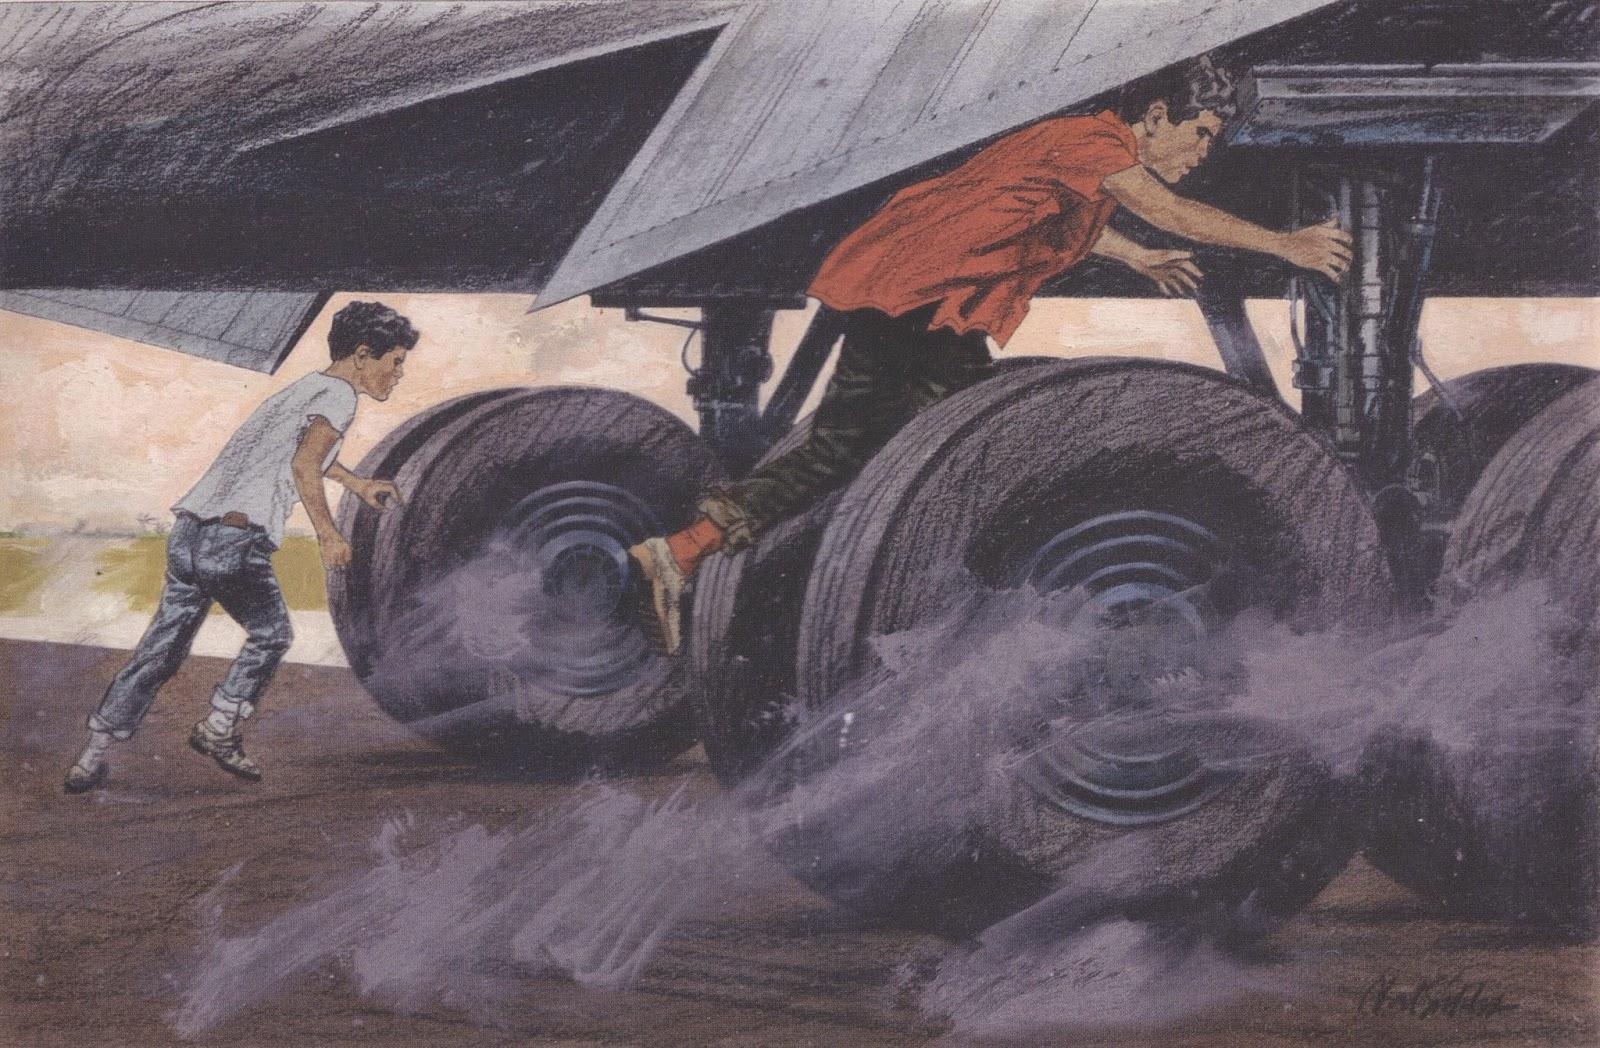 Drawn smoke tire ART: Noel ILLUSTRATION Sickles February